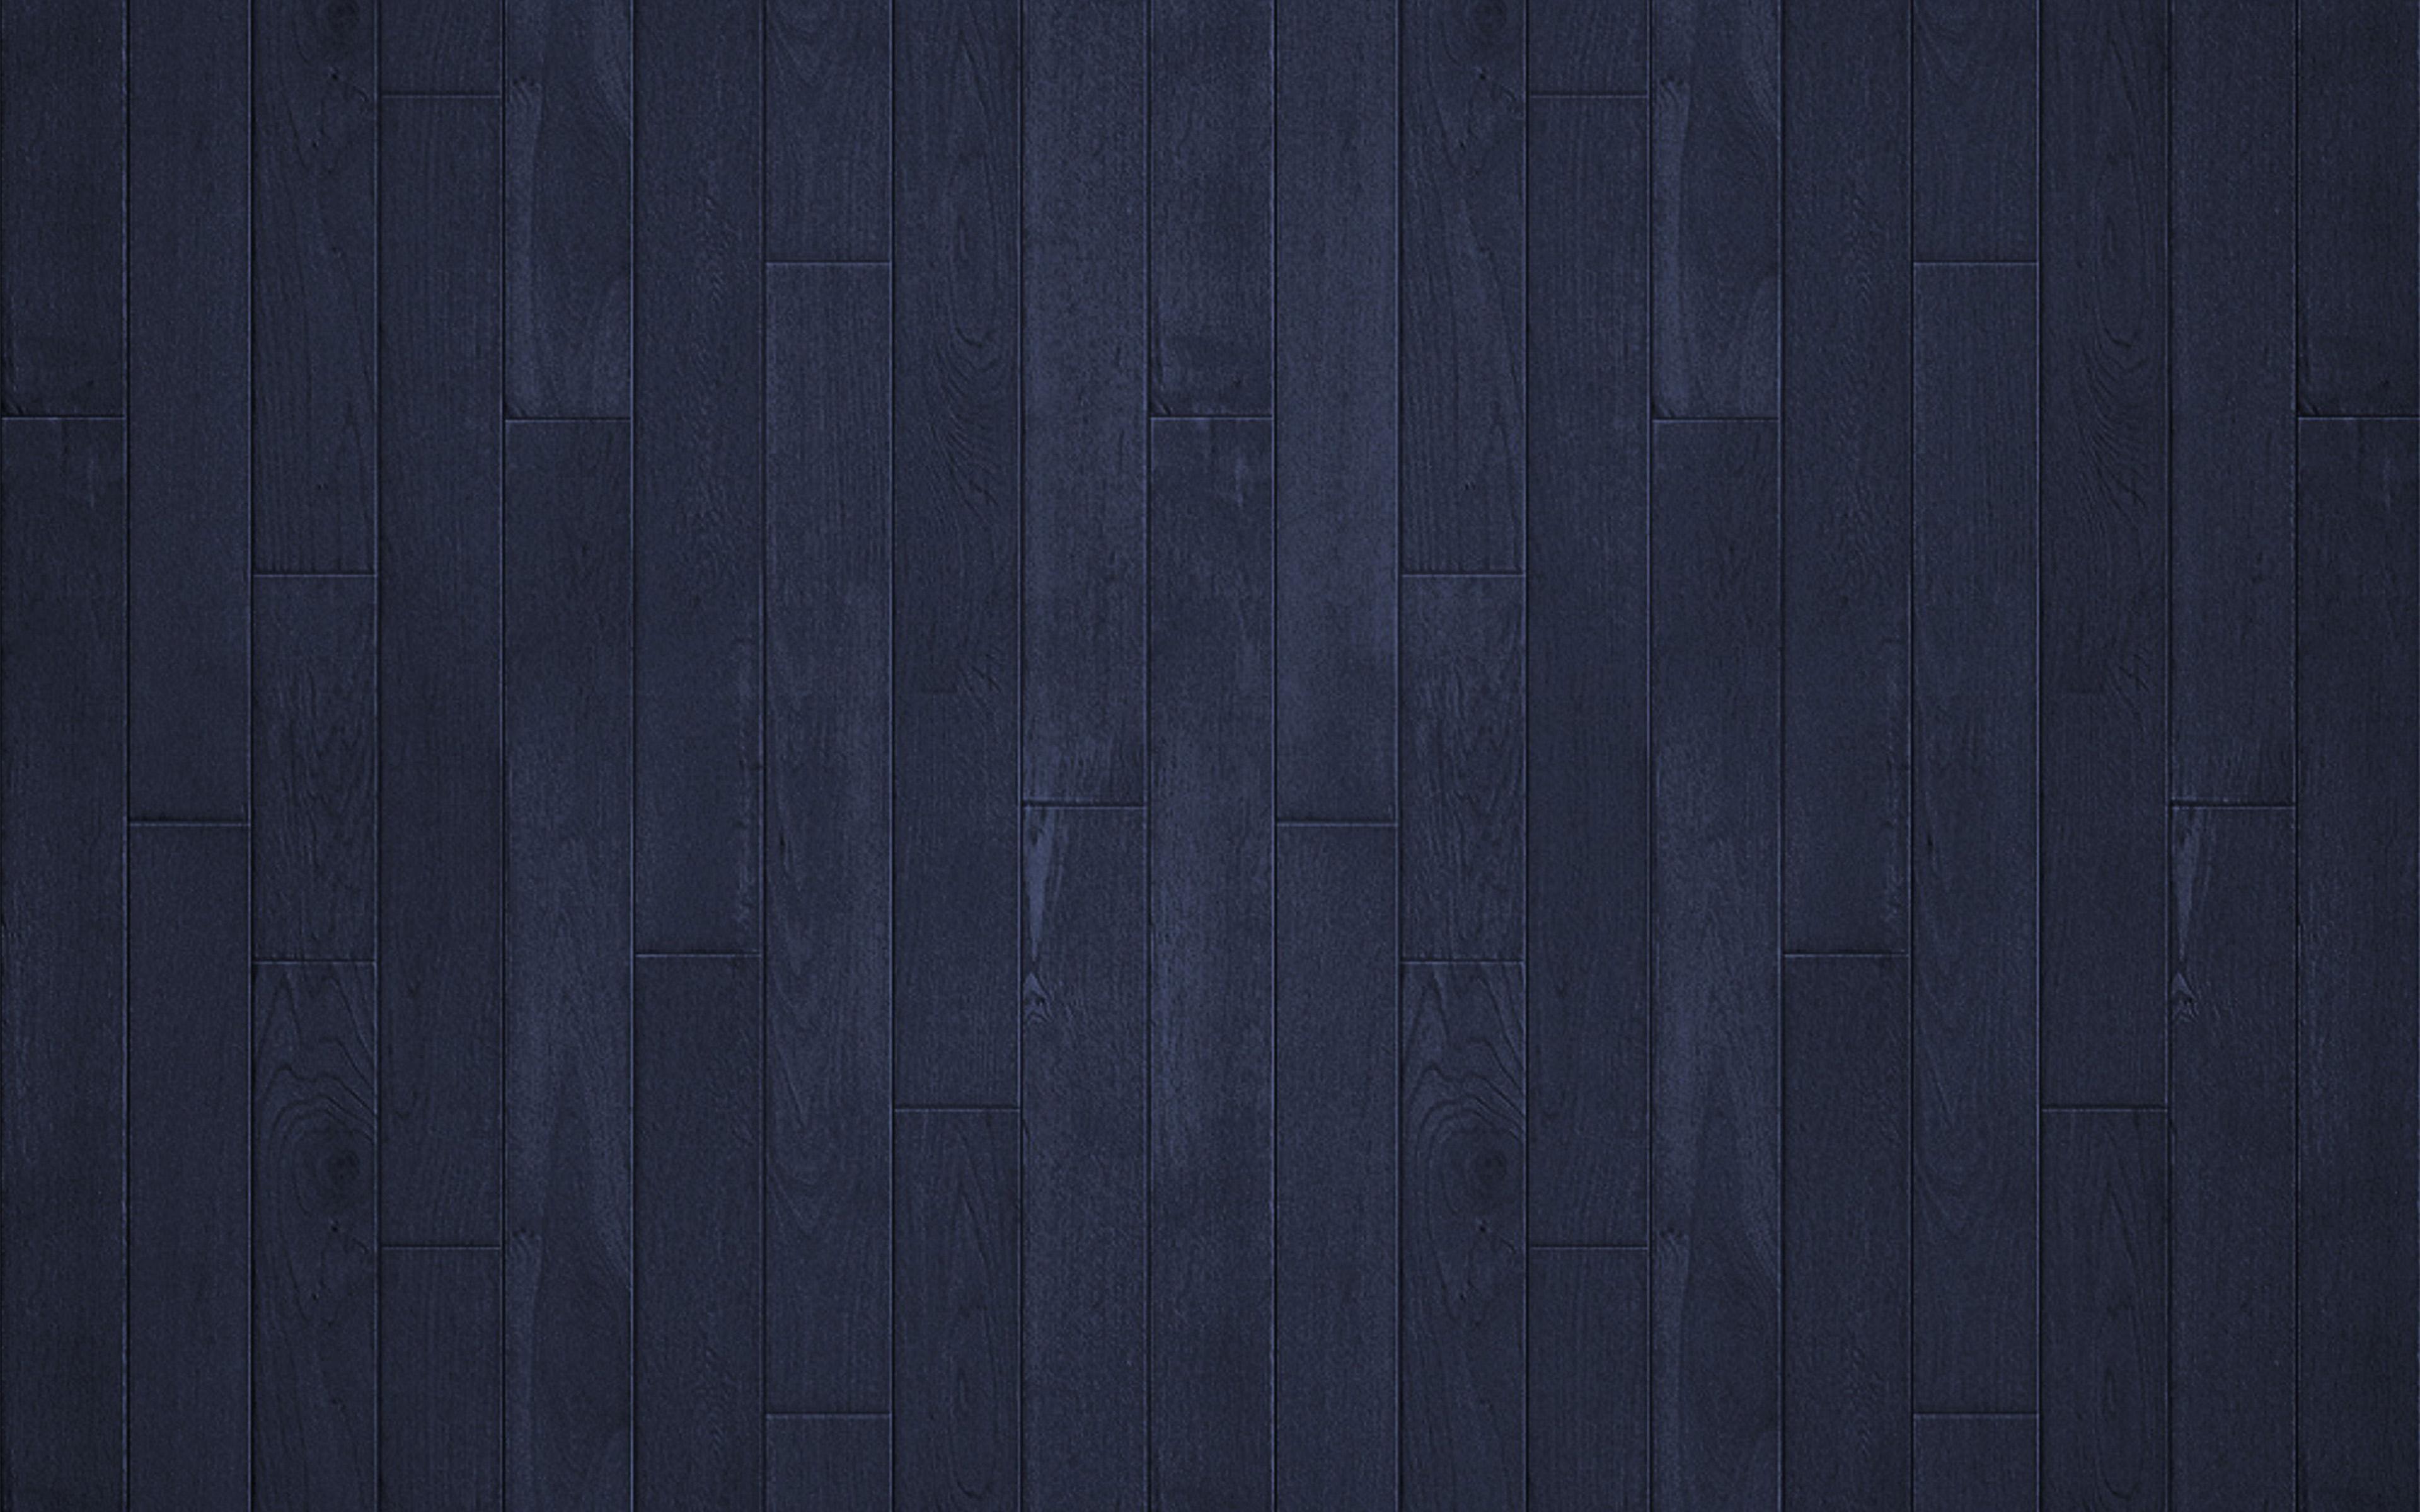 Papersco Desktop Wallpaper Vt88 Texture Blue Wood Dark Nature